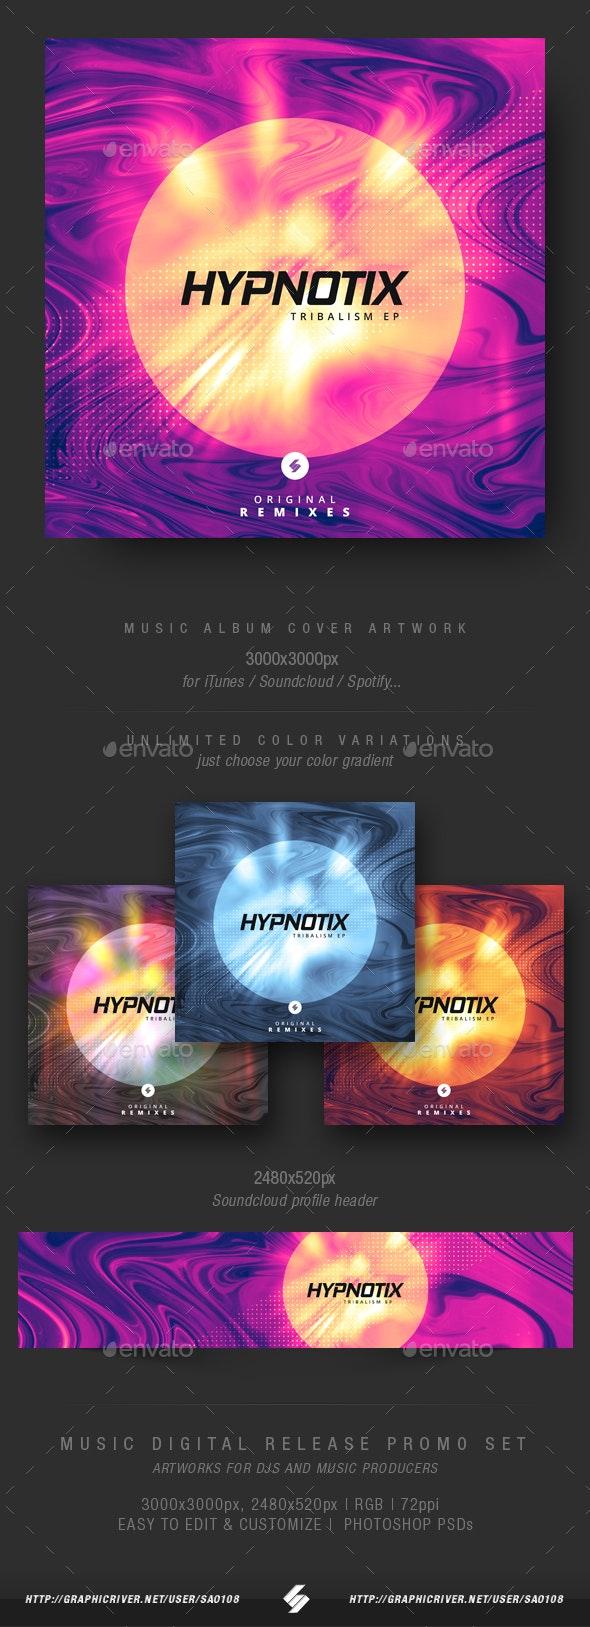 Hypnotix - Electronic Music Album Cover Template - Miscellaneous Social Media